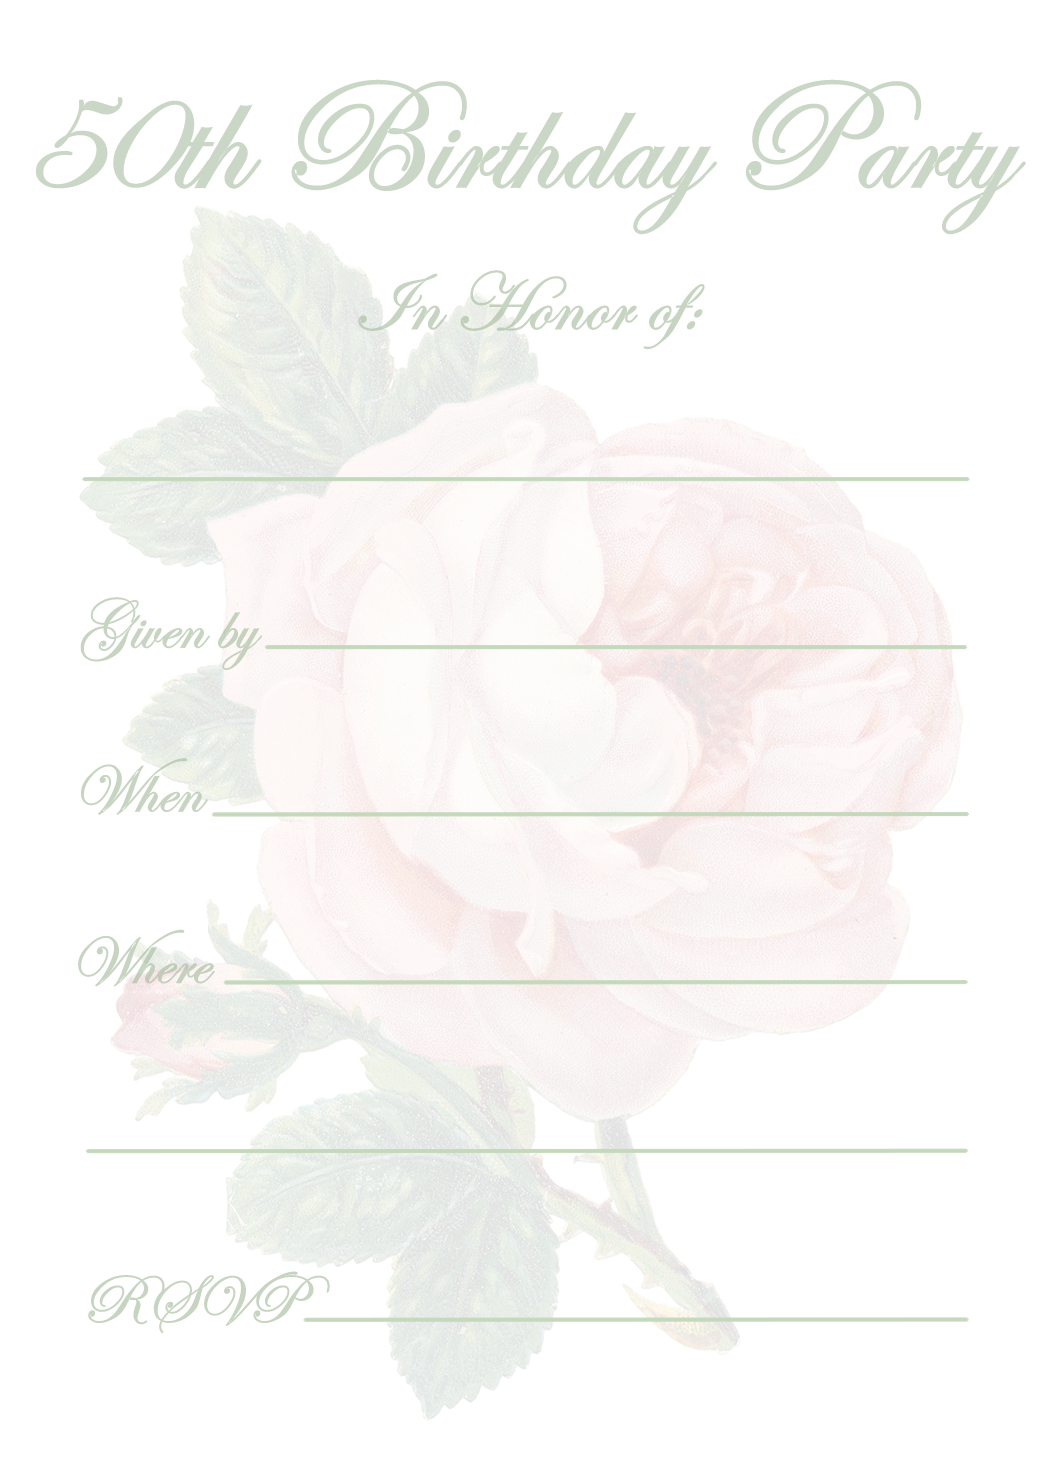 Free printable 50th birthday party invitation templates for Template for 50th birthday invitations free printable